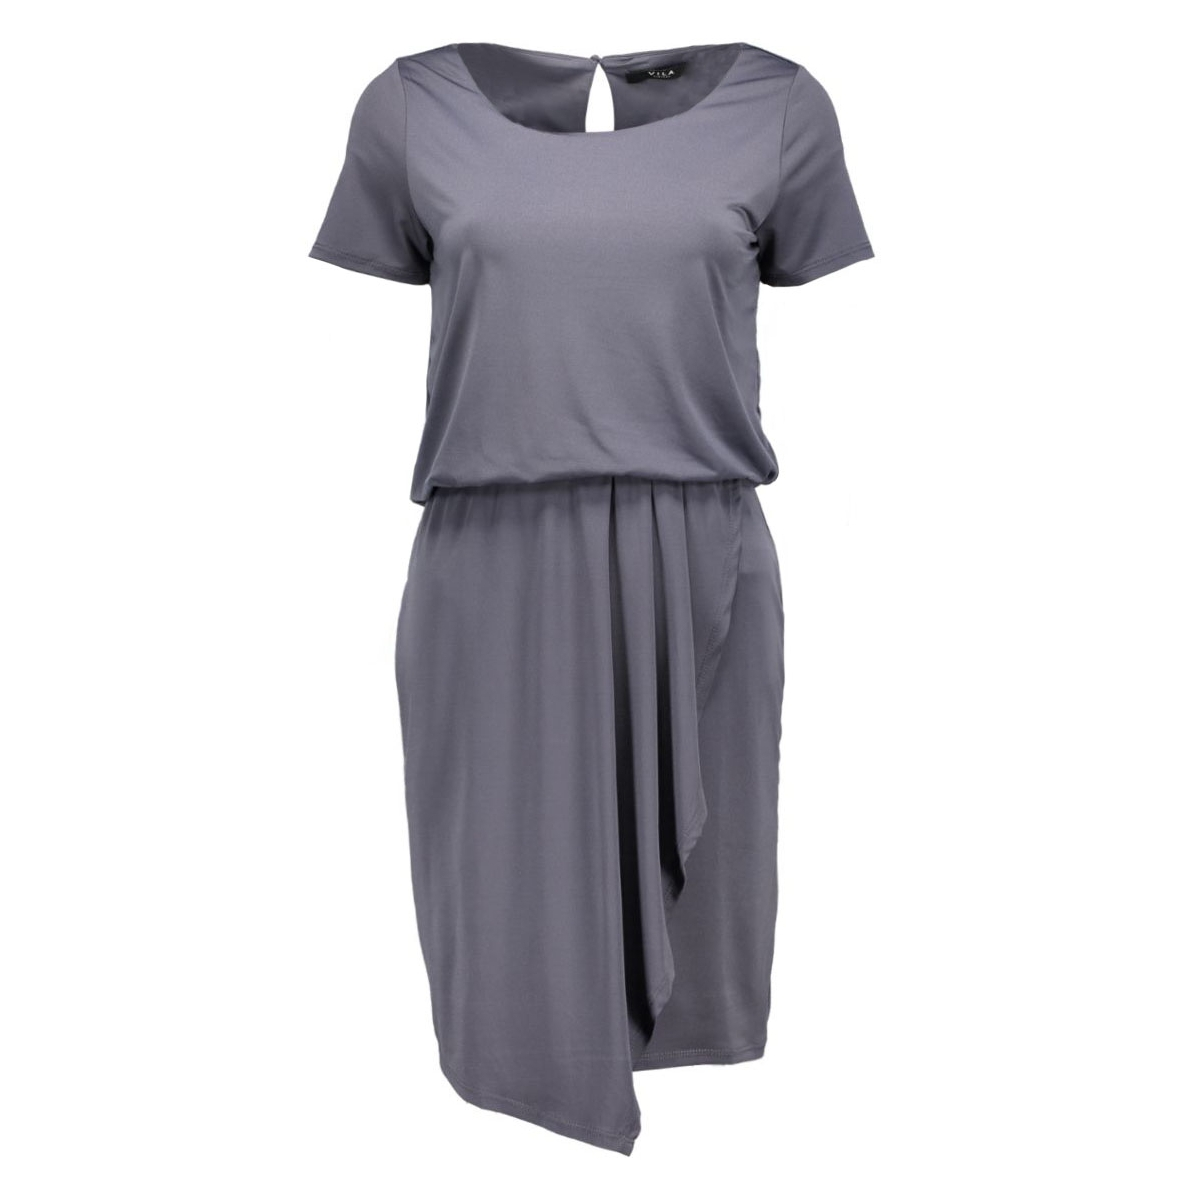 vipalli s/s dress 14036929 vila jurk ebony